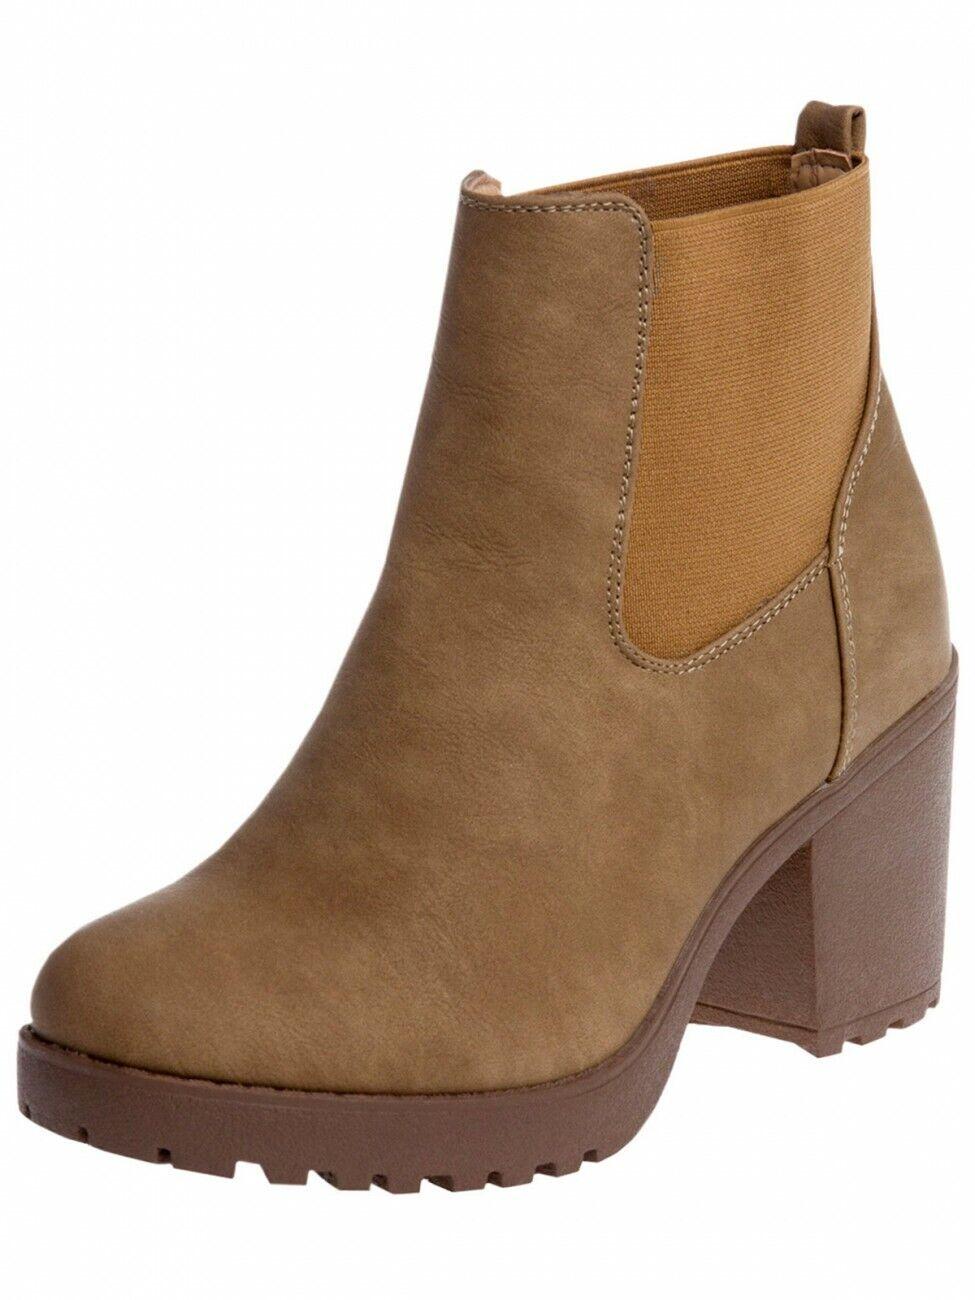 CASPAR SBO045 Womens Vintage Platform Chelsea Ankle Boots with Block Heel